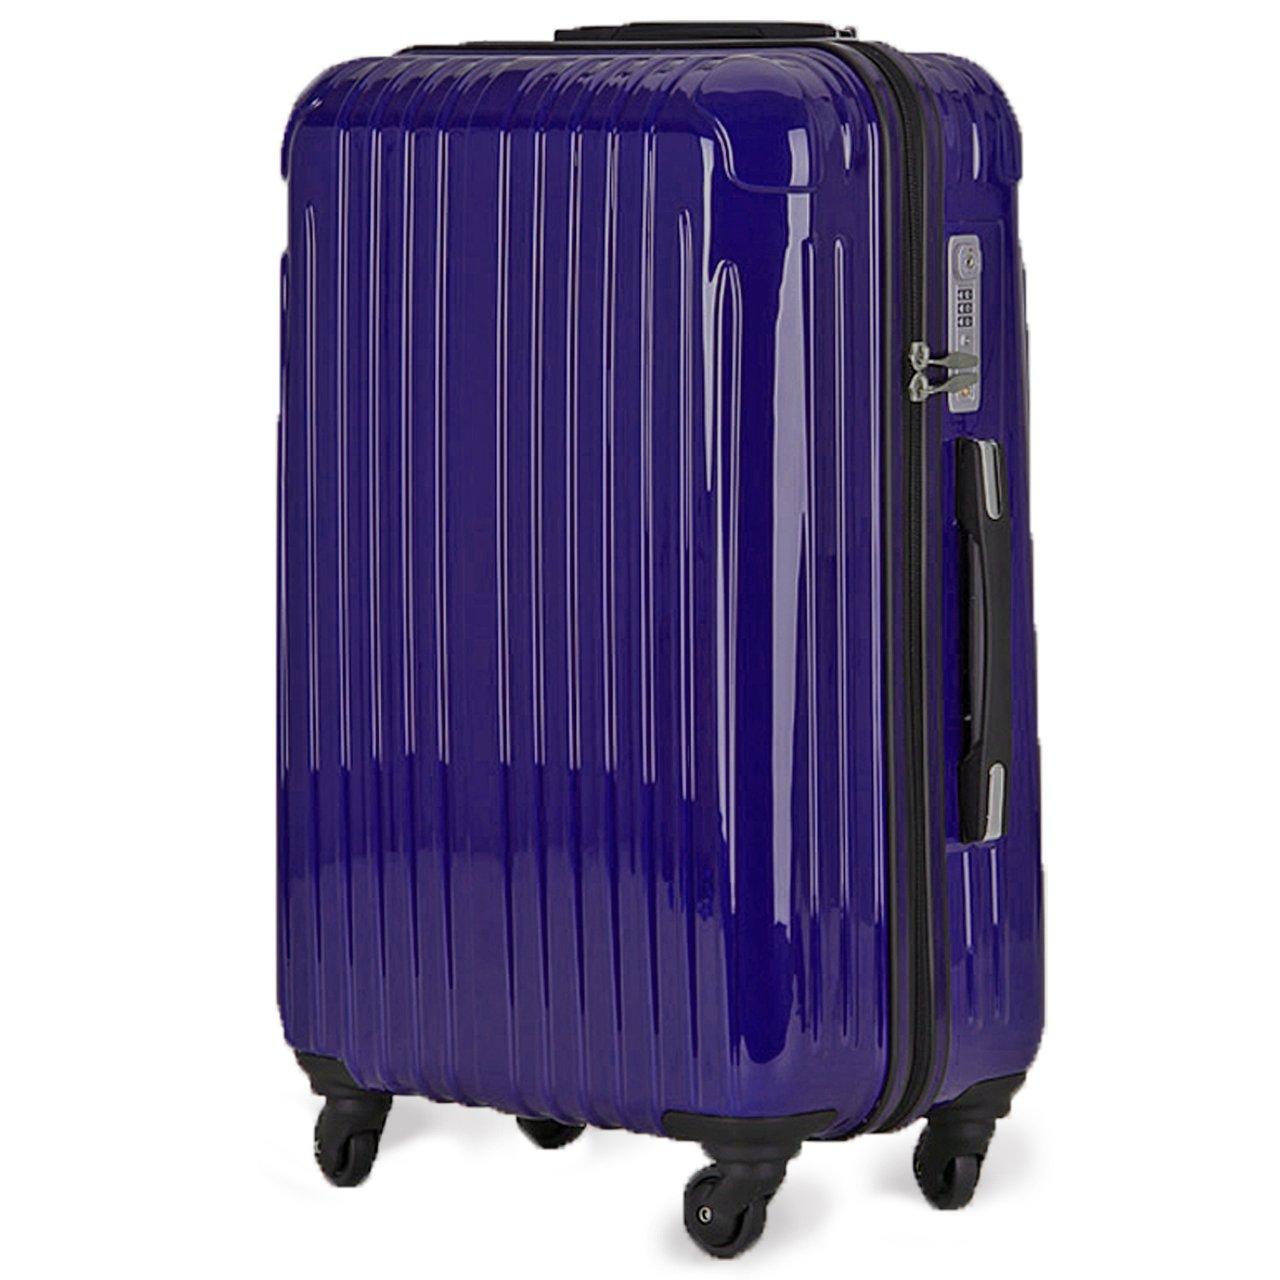 strike[ストライク]超軽量 2年保証 スーツケース TSAロック搭載 旅行バック トランクケース 旅行カバン B079M3TRJB 大型アウトレット|パープルネイビー パープルネイビー 大型アウトレット